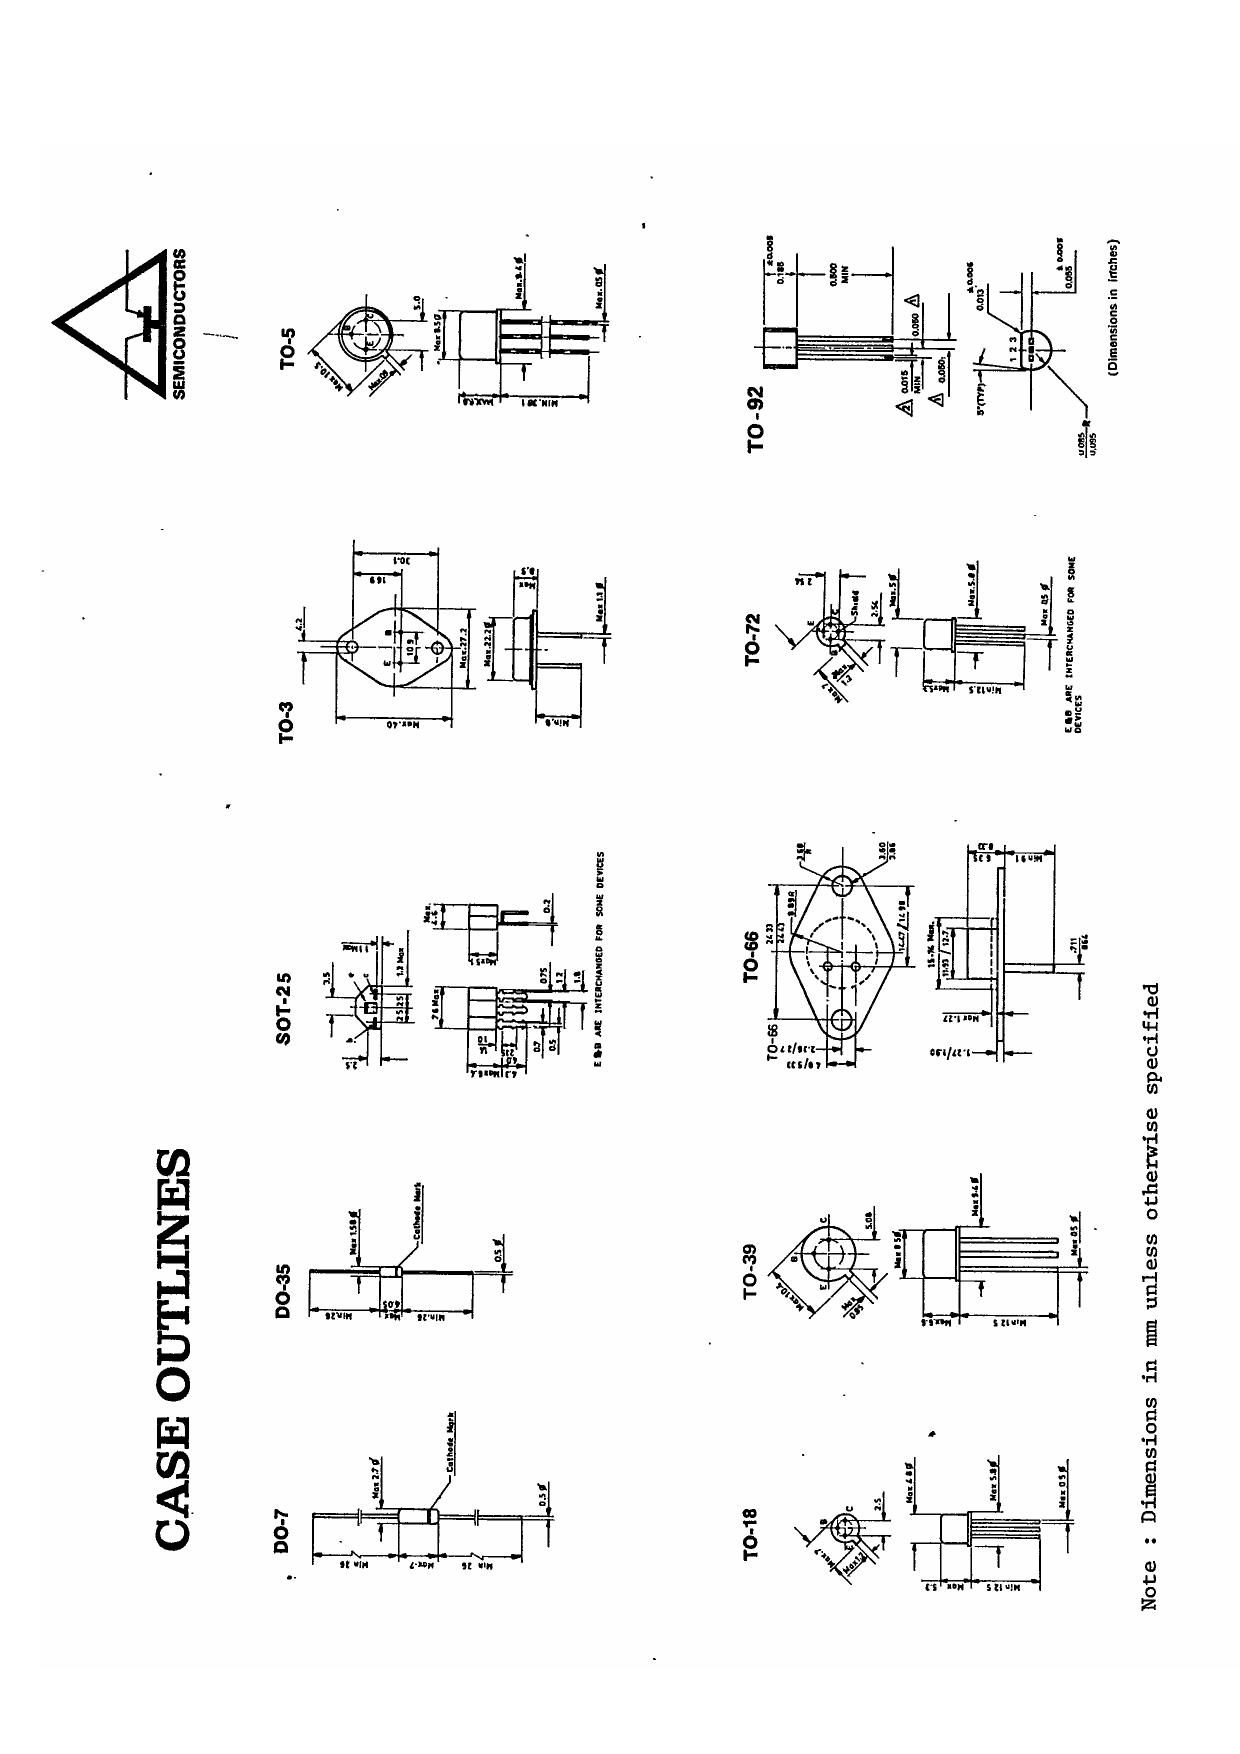 SK100 pdf schematic